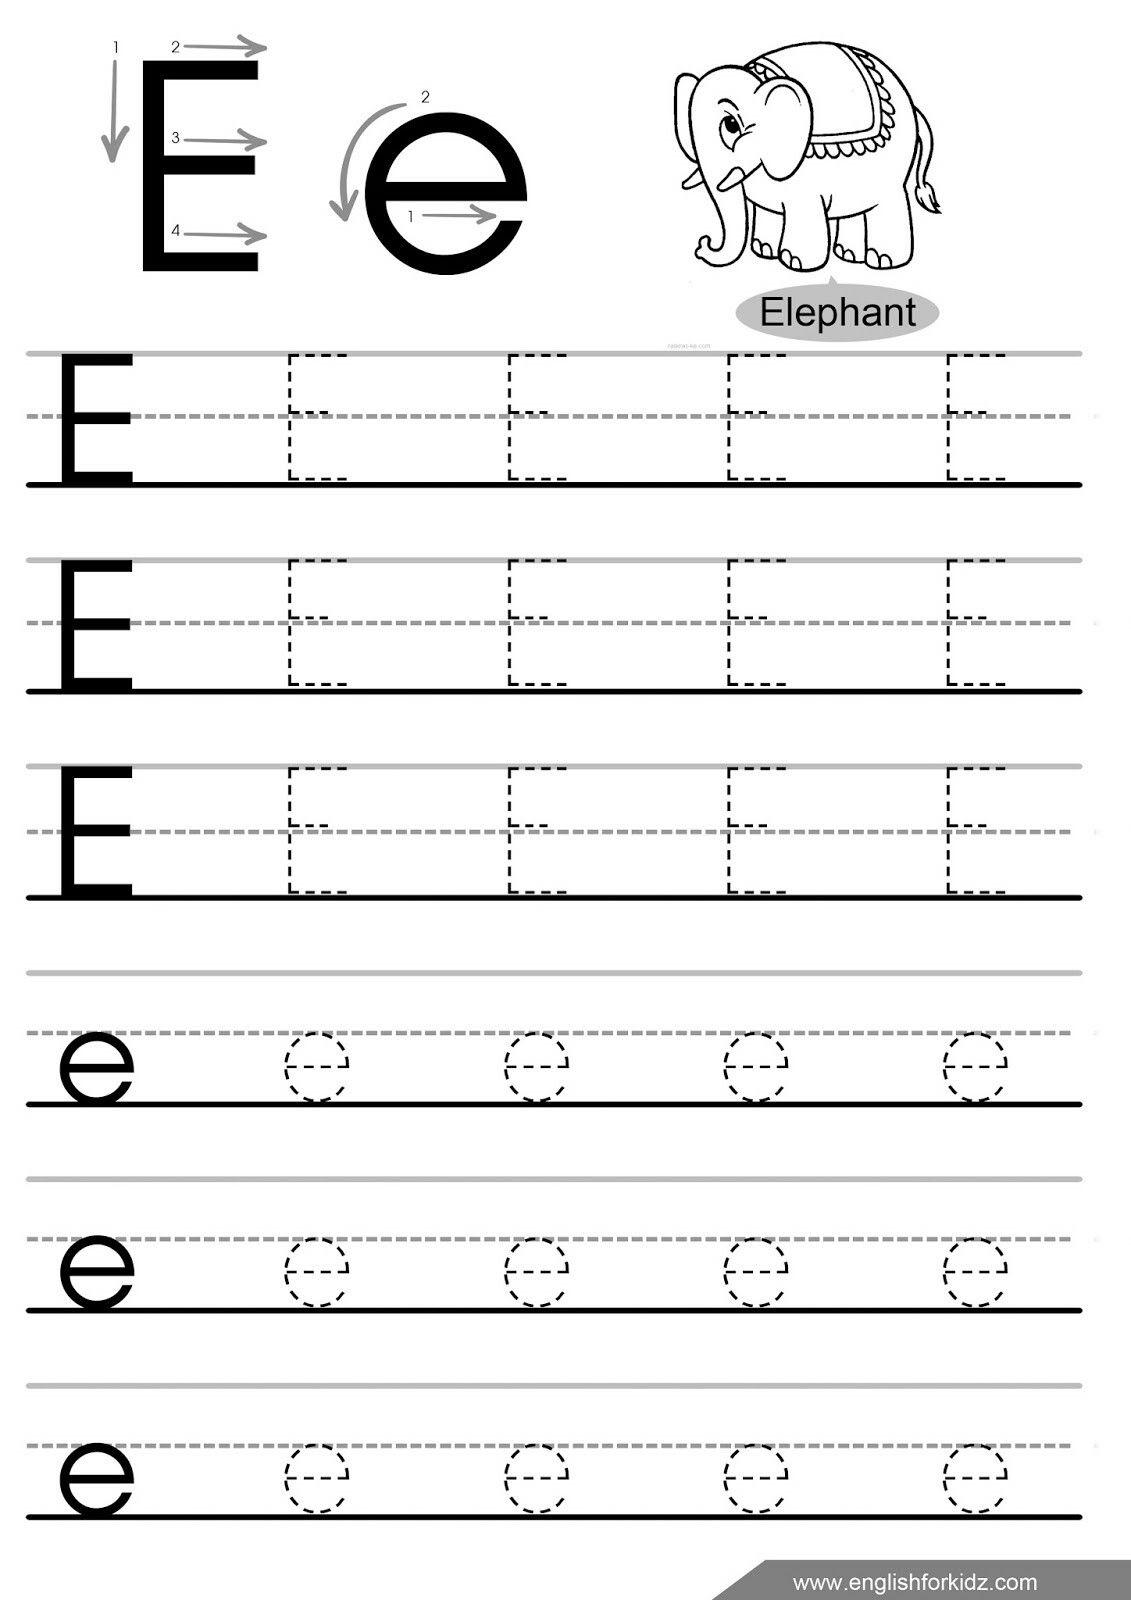 Pin By Stephanie Barrett On Alphabet Tracing Worksheets In 2020 Tracing Worksheets Preschool Tracing Worksheets Letter Worksheets For Preschool